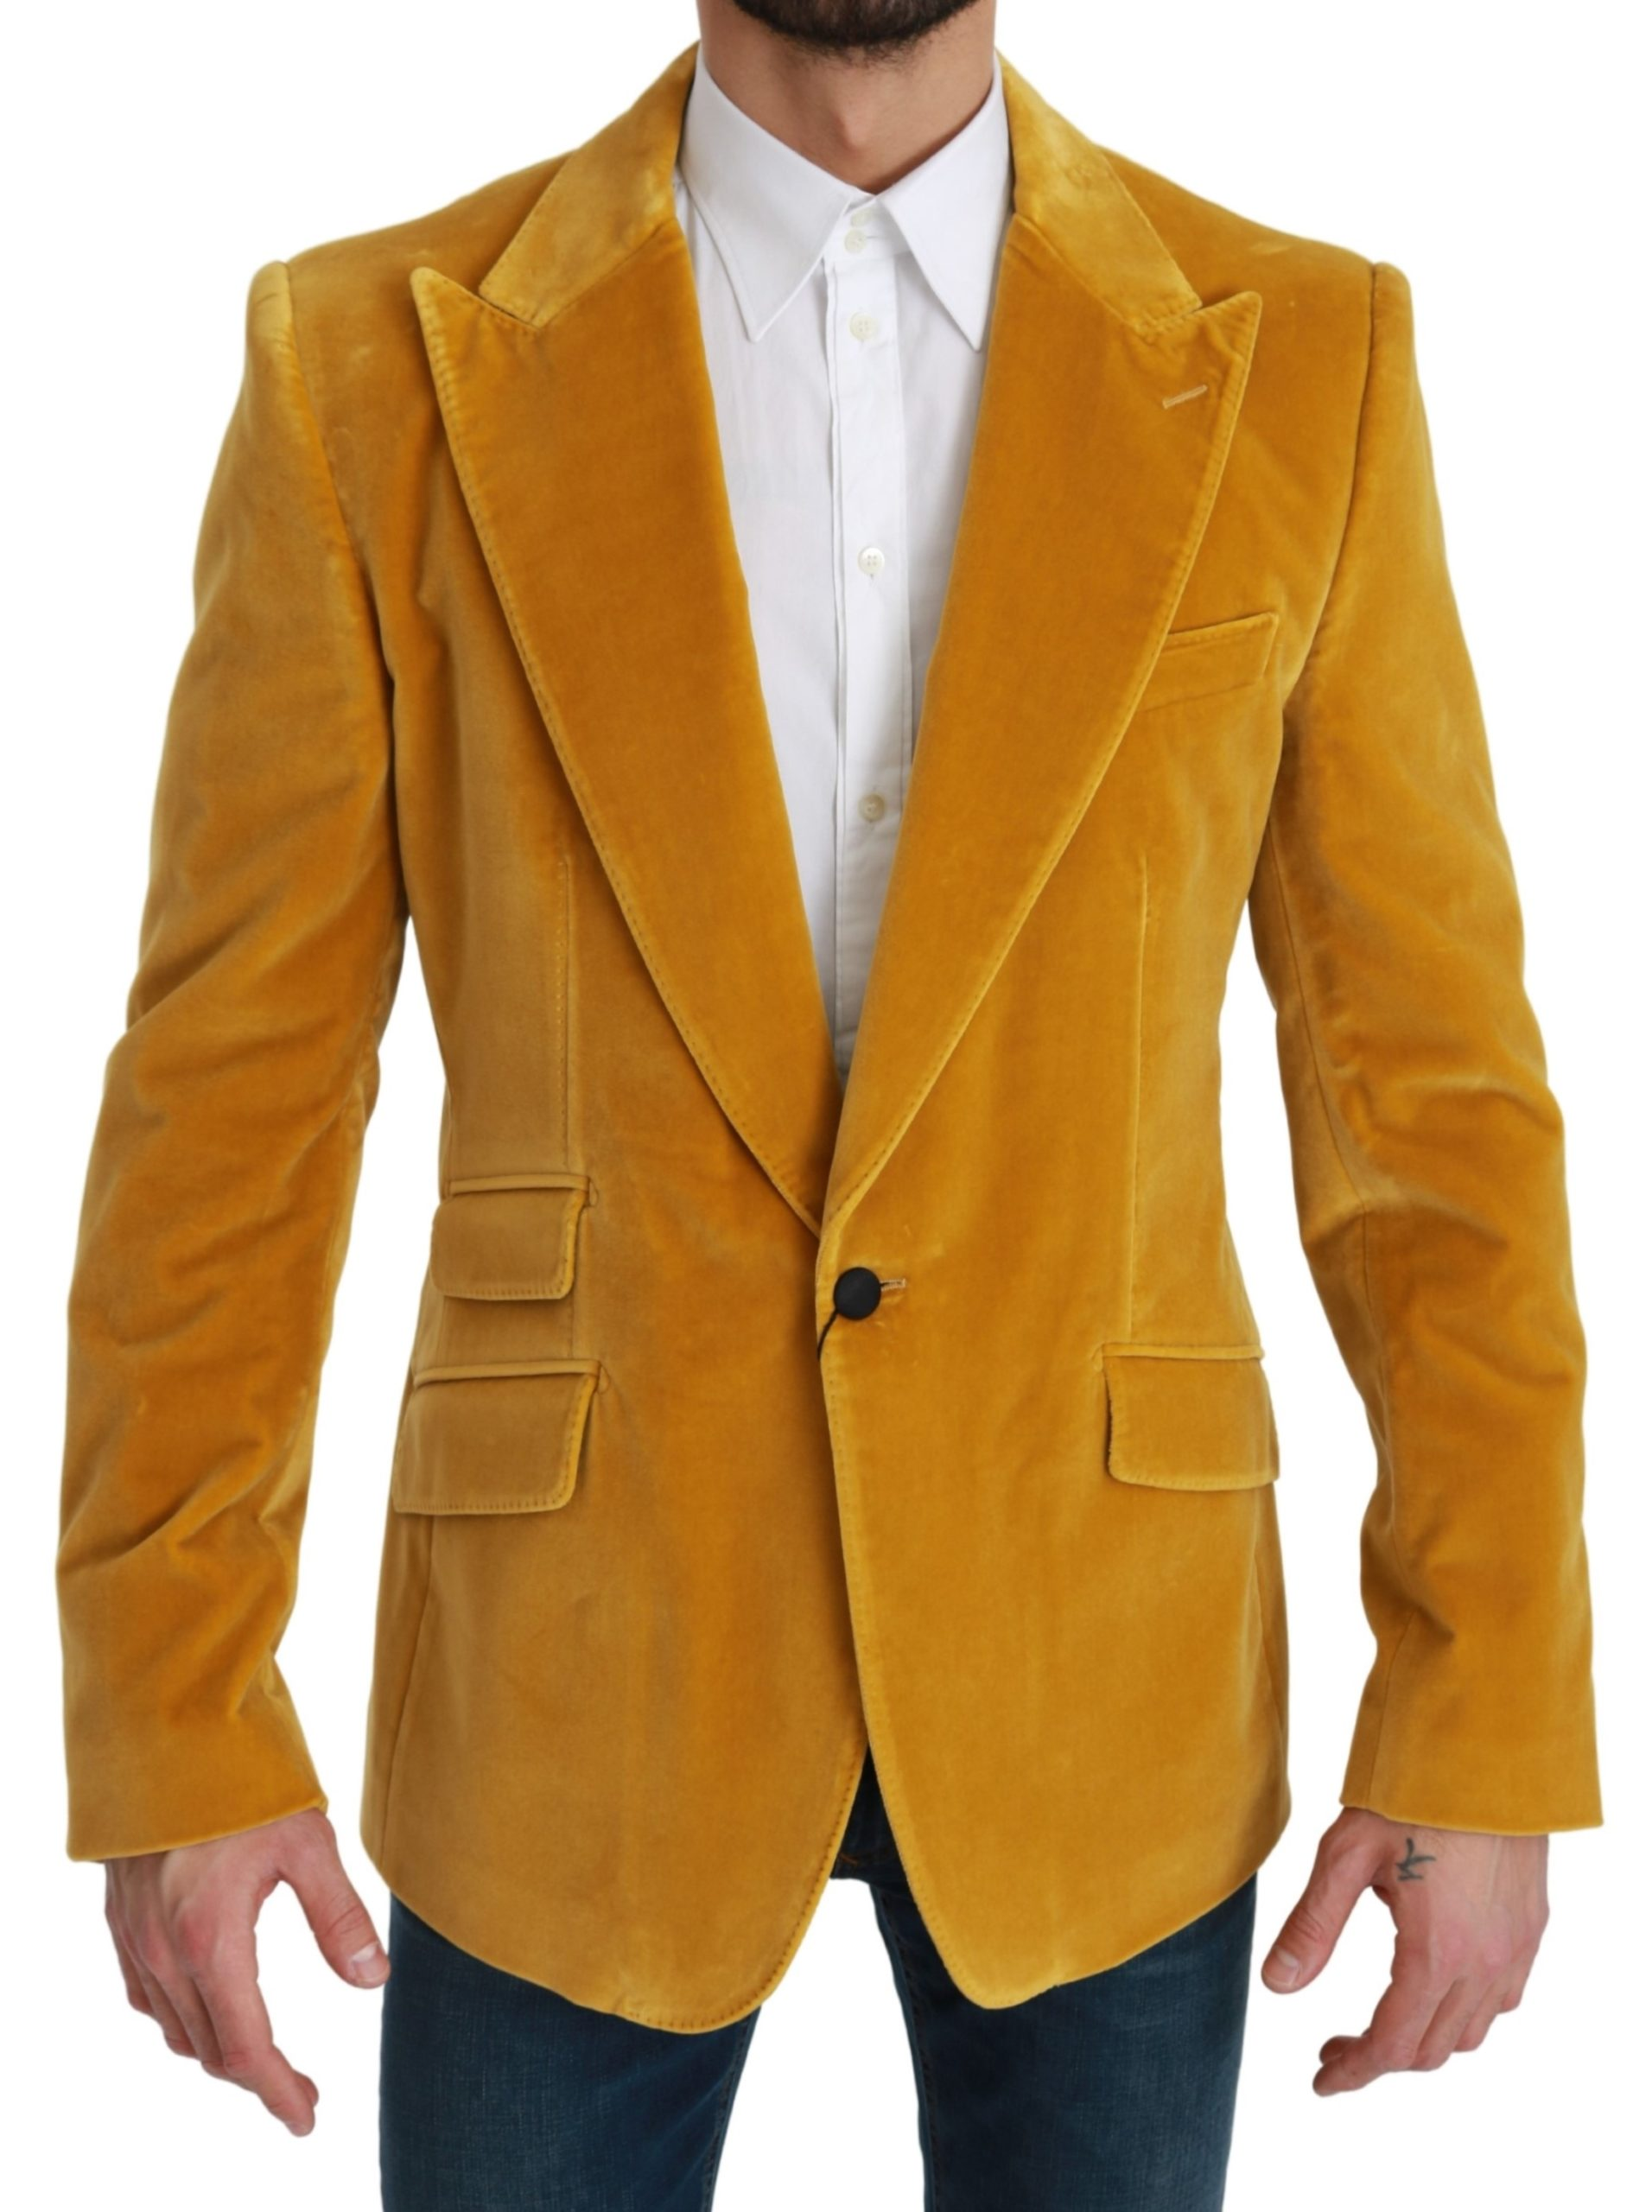 Dolce & Gabbana Men's Velvet Slim Fit Jacket SICILIA Blazer Yellow KOS1787 - IT52   L